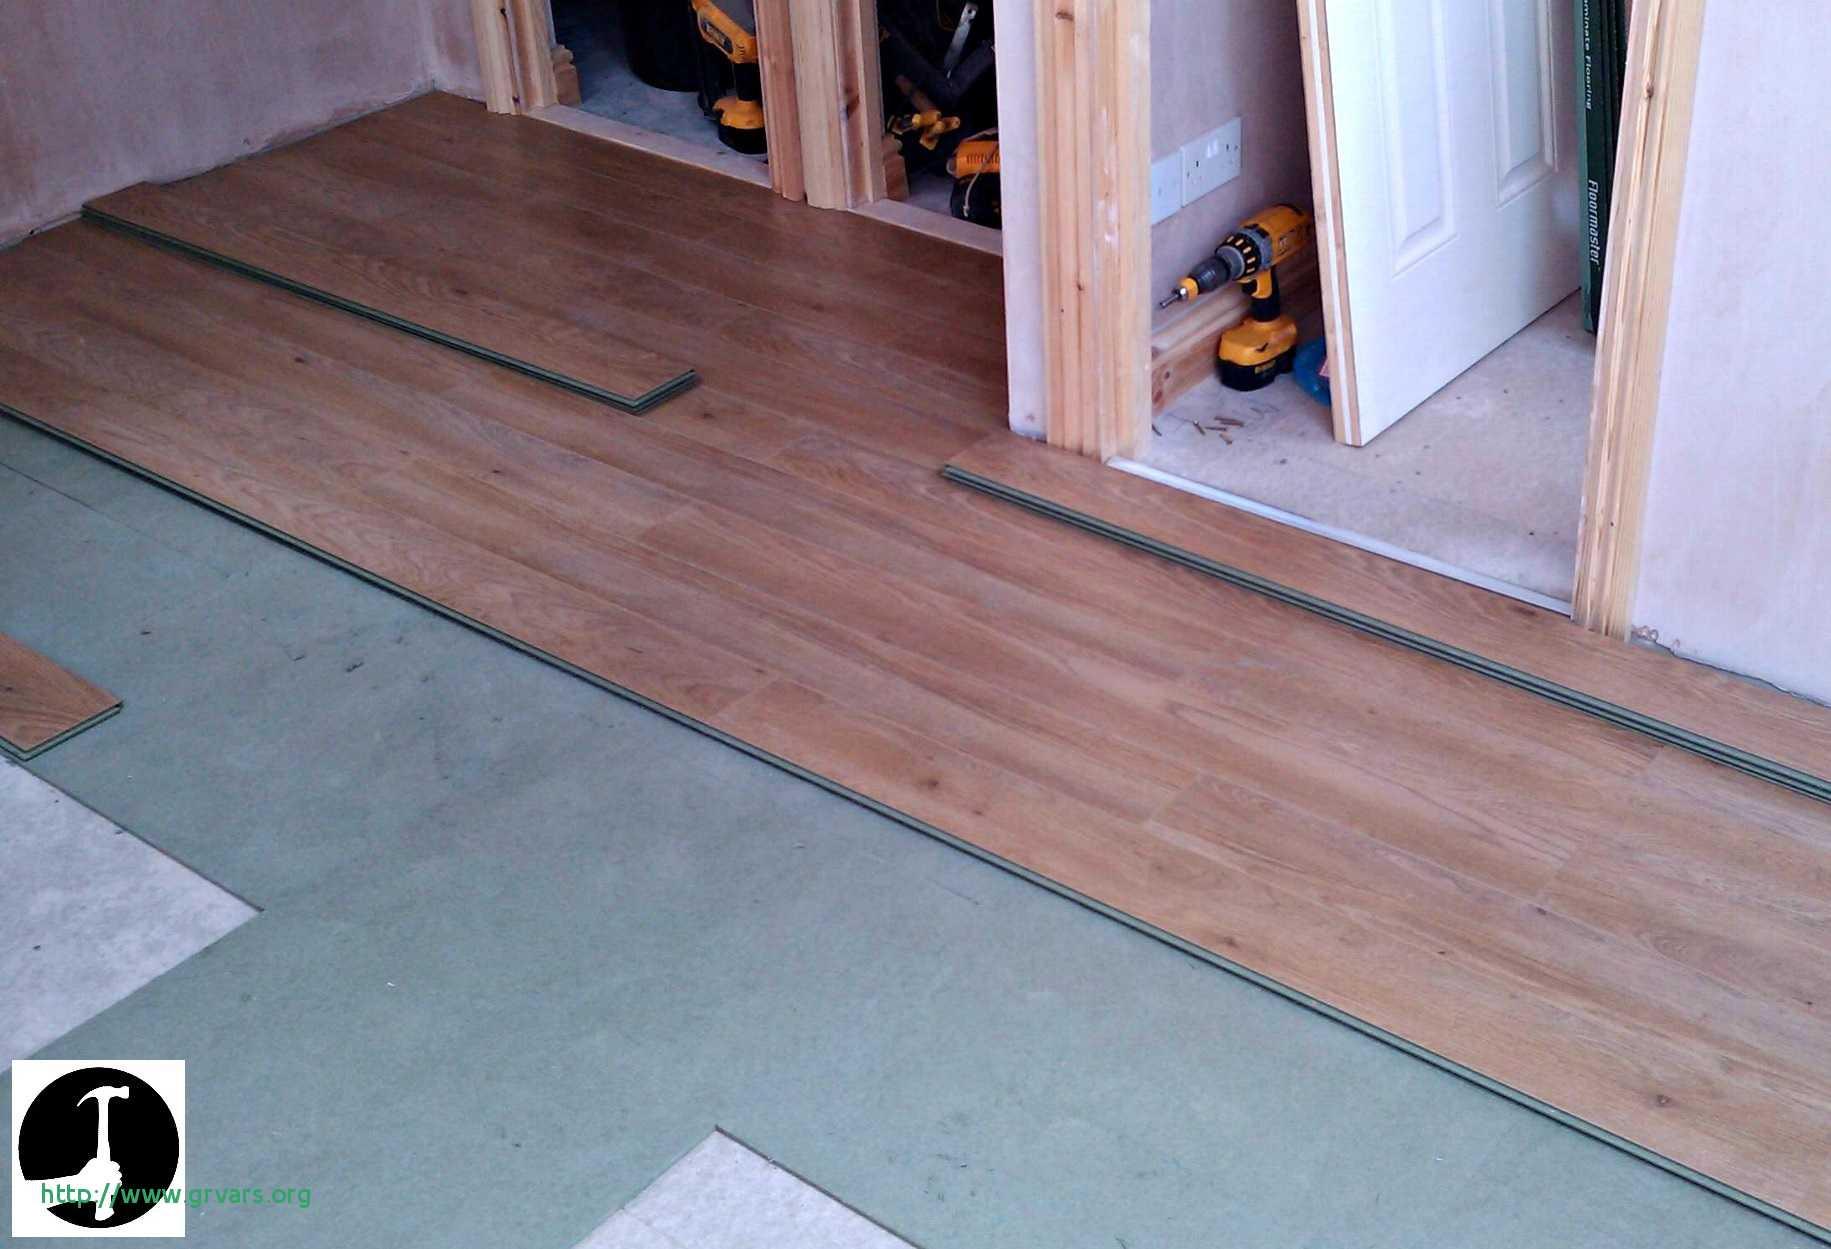 hardwood floor installation kalamazoo of 21 unique pattern for laying hardwood flooring ideas blog throughout pattern for laying hardwood flooring a‰lagant how to install laminate flooring